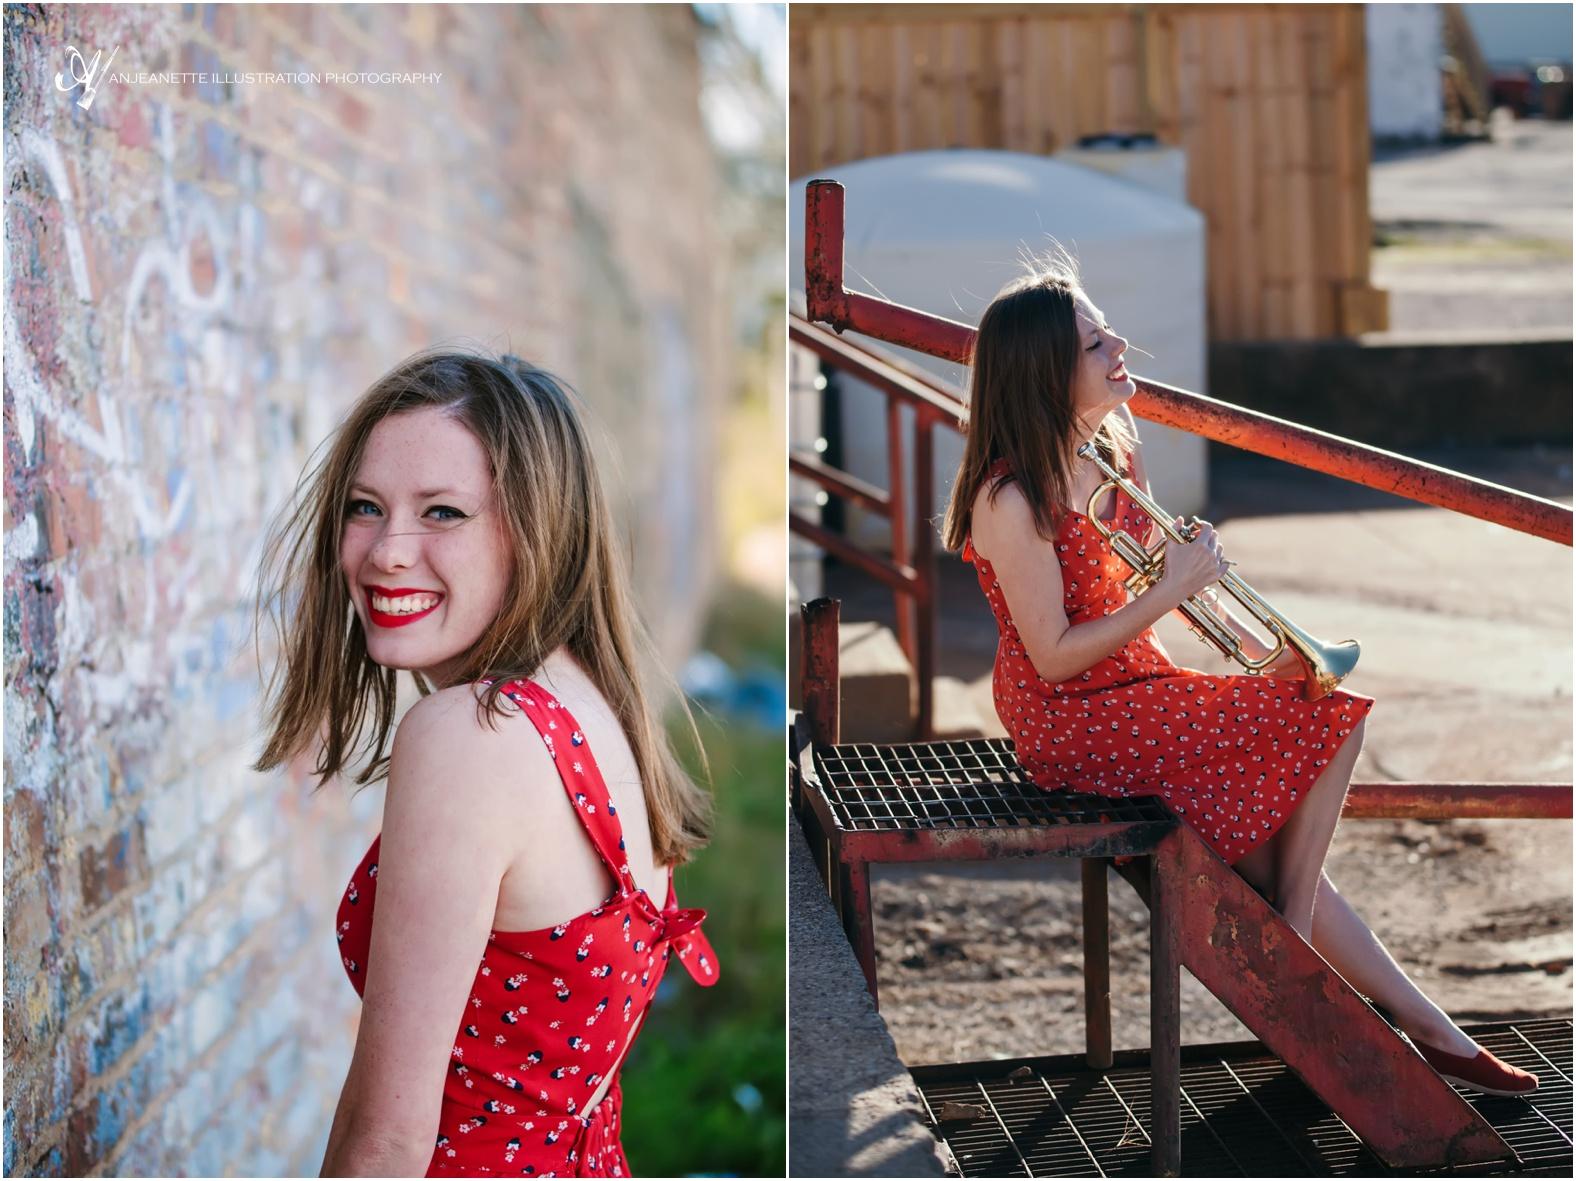 Senior Photos in Hendersonville Tn by Artistic Senior Picture Photographer Anjeanette Illustration Photography